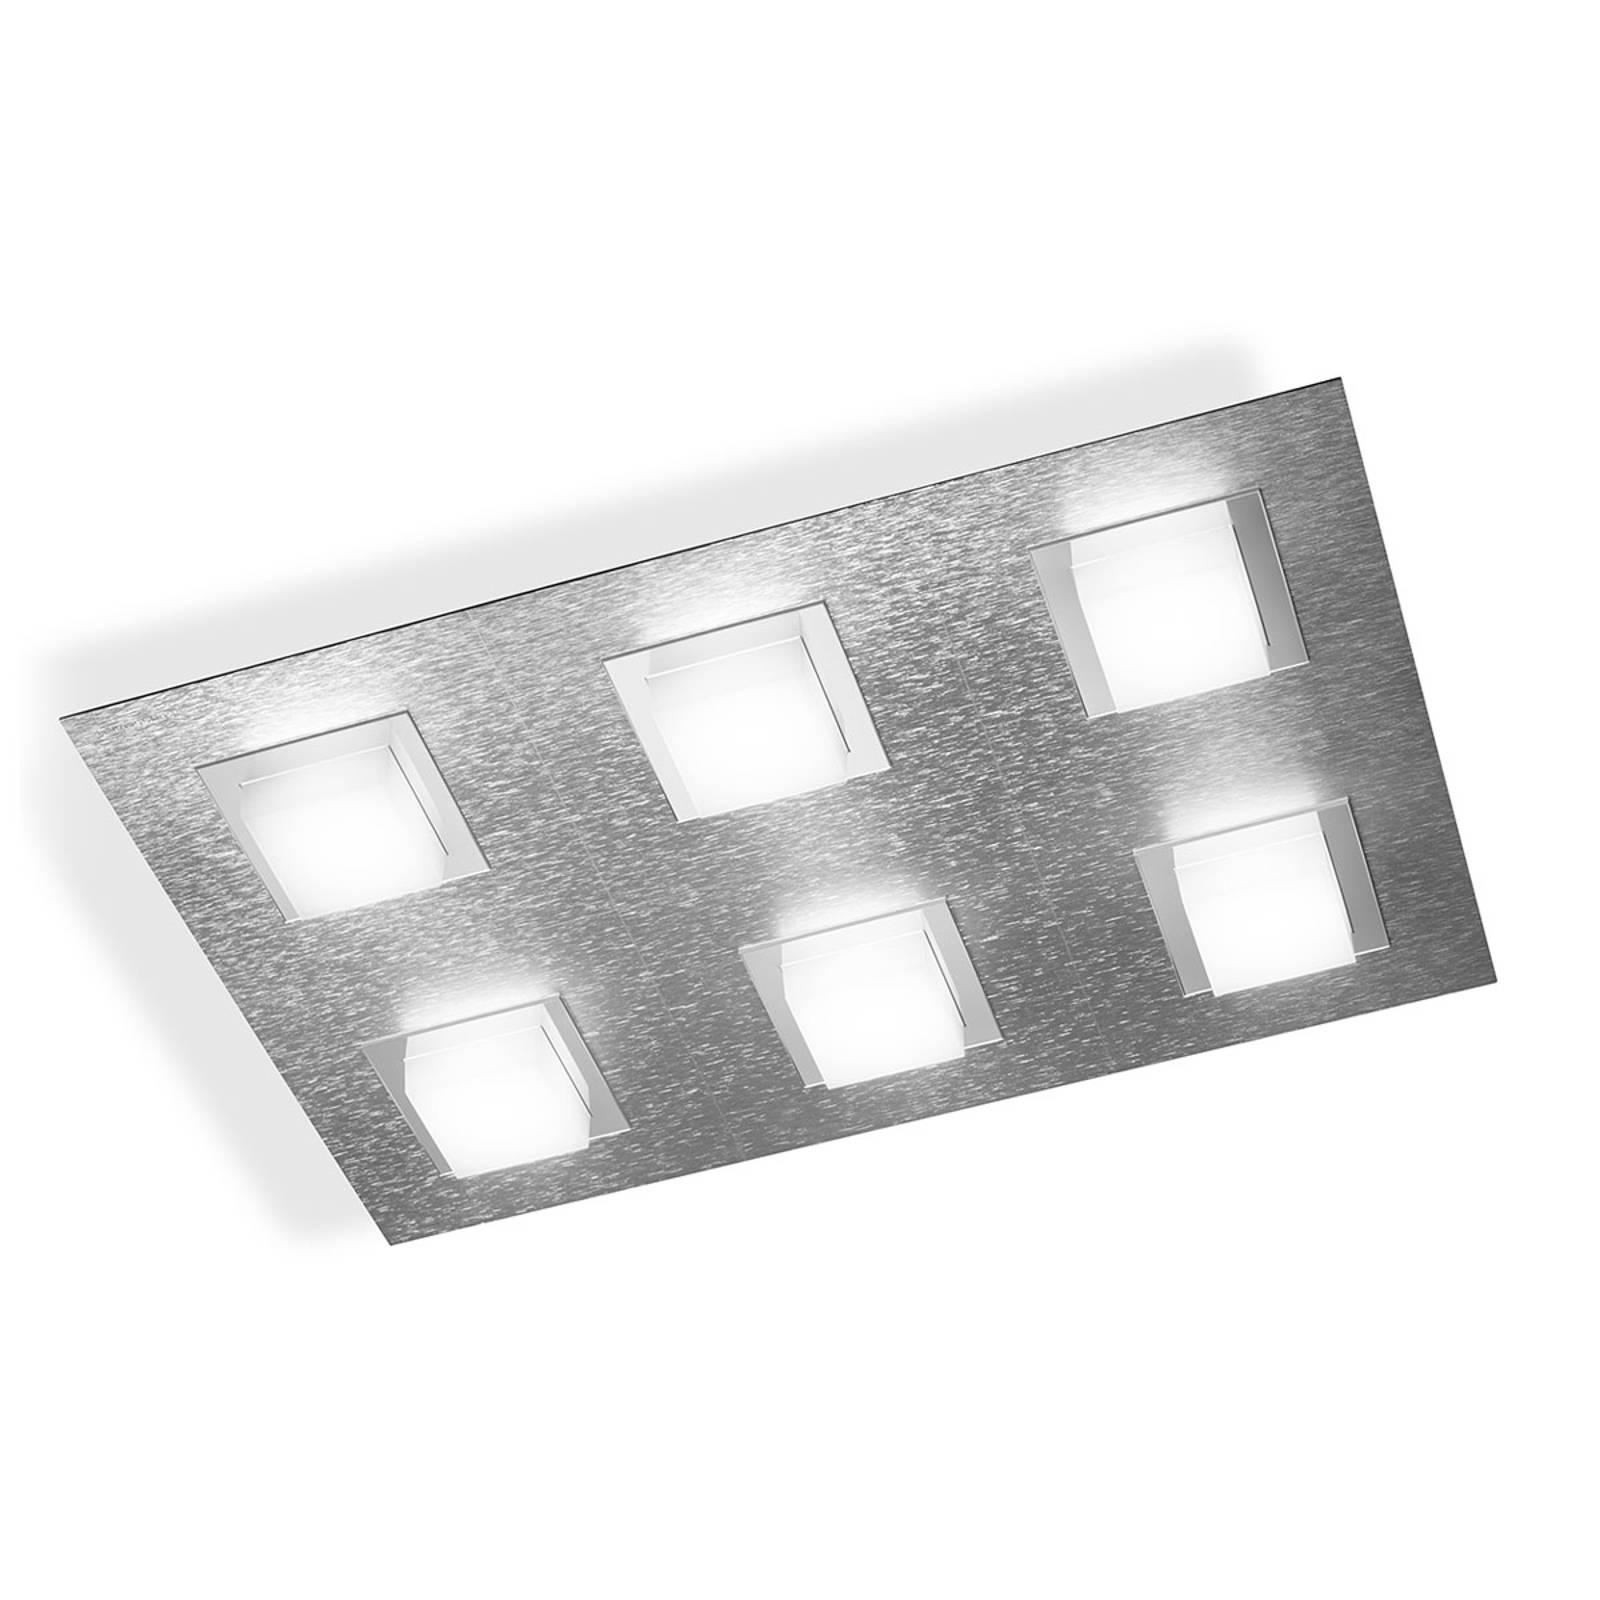 GROSSMANN Basic LED-kattovalaisin, 6-lampp., alu